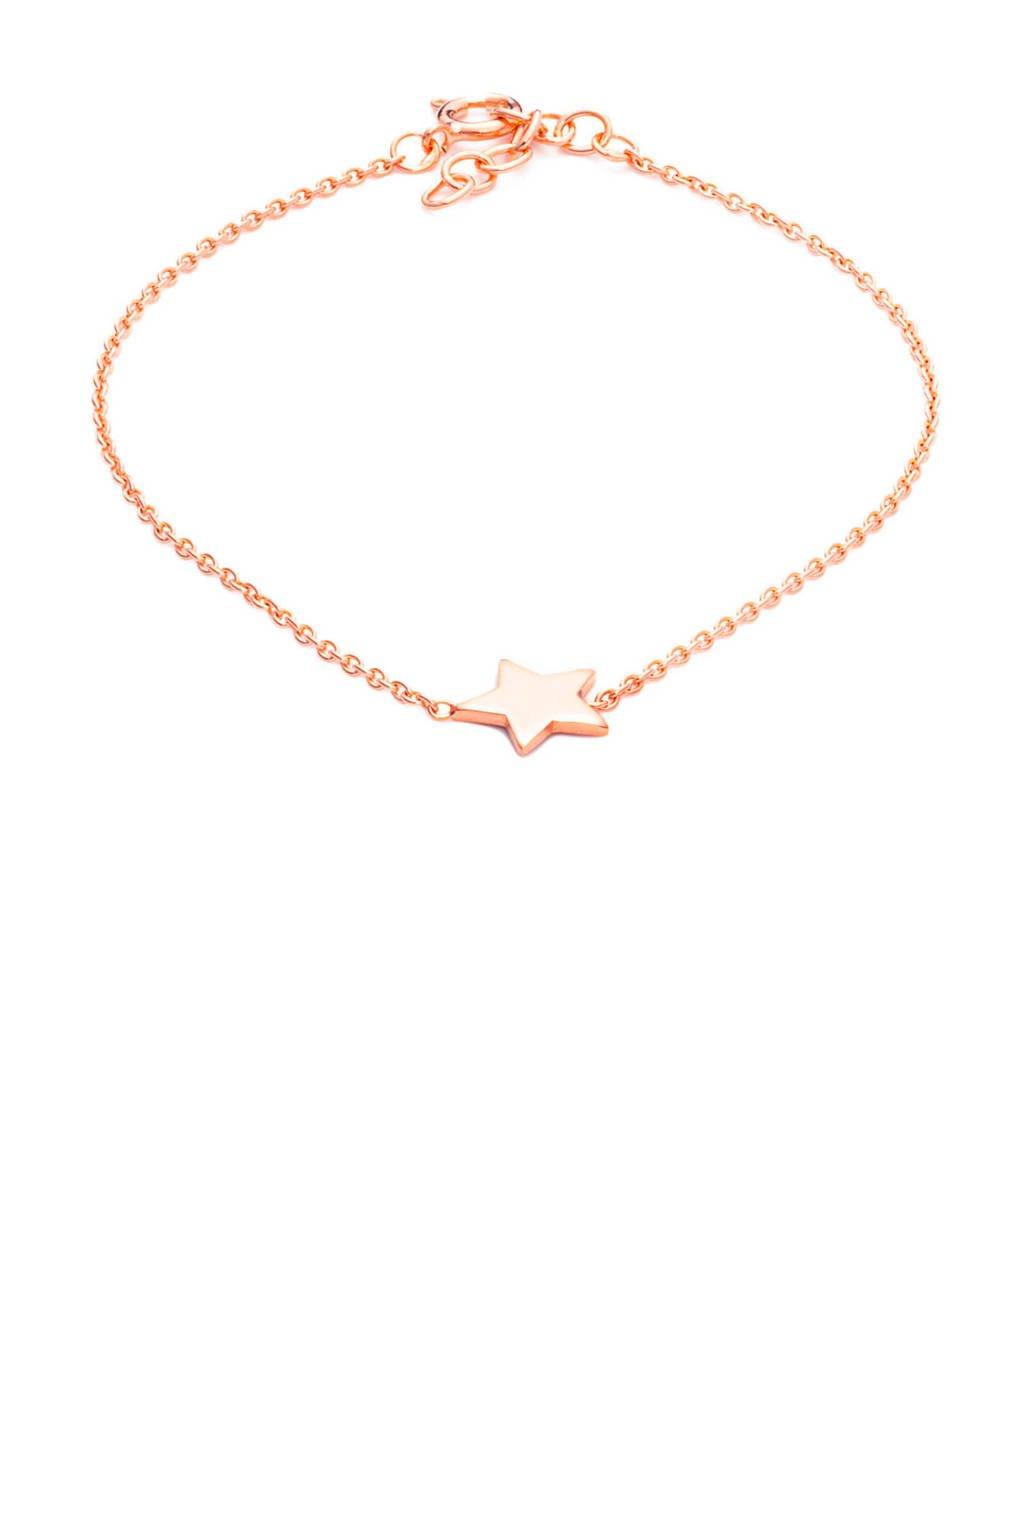 Selected Jewels armband SJ2010103 roségoudkleurig, Zilverkleurig